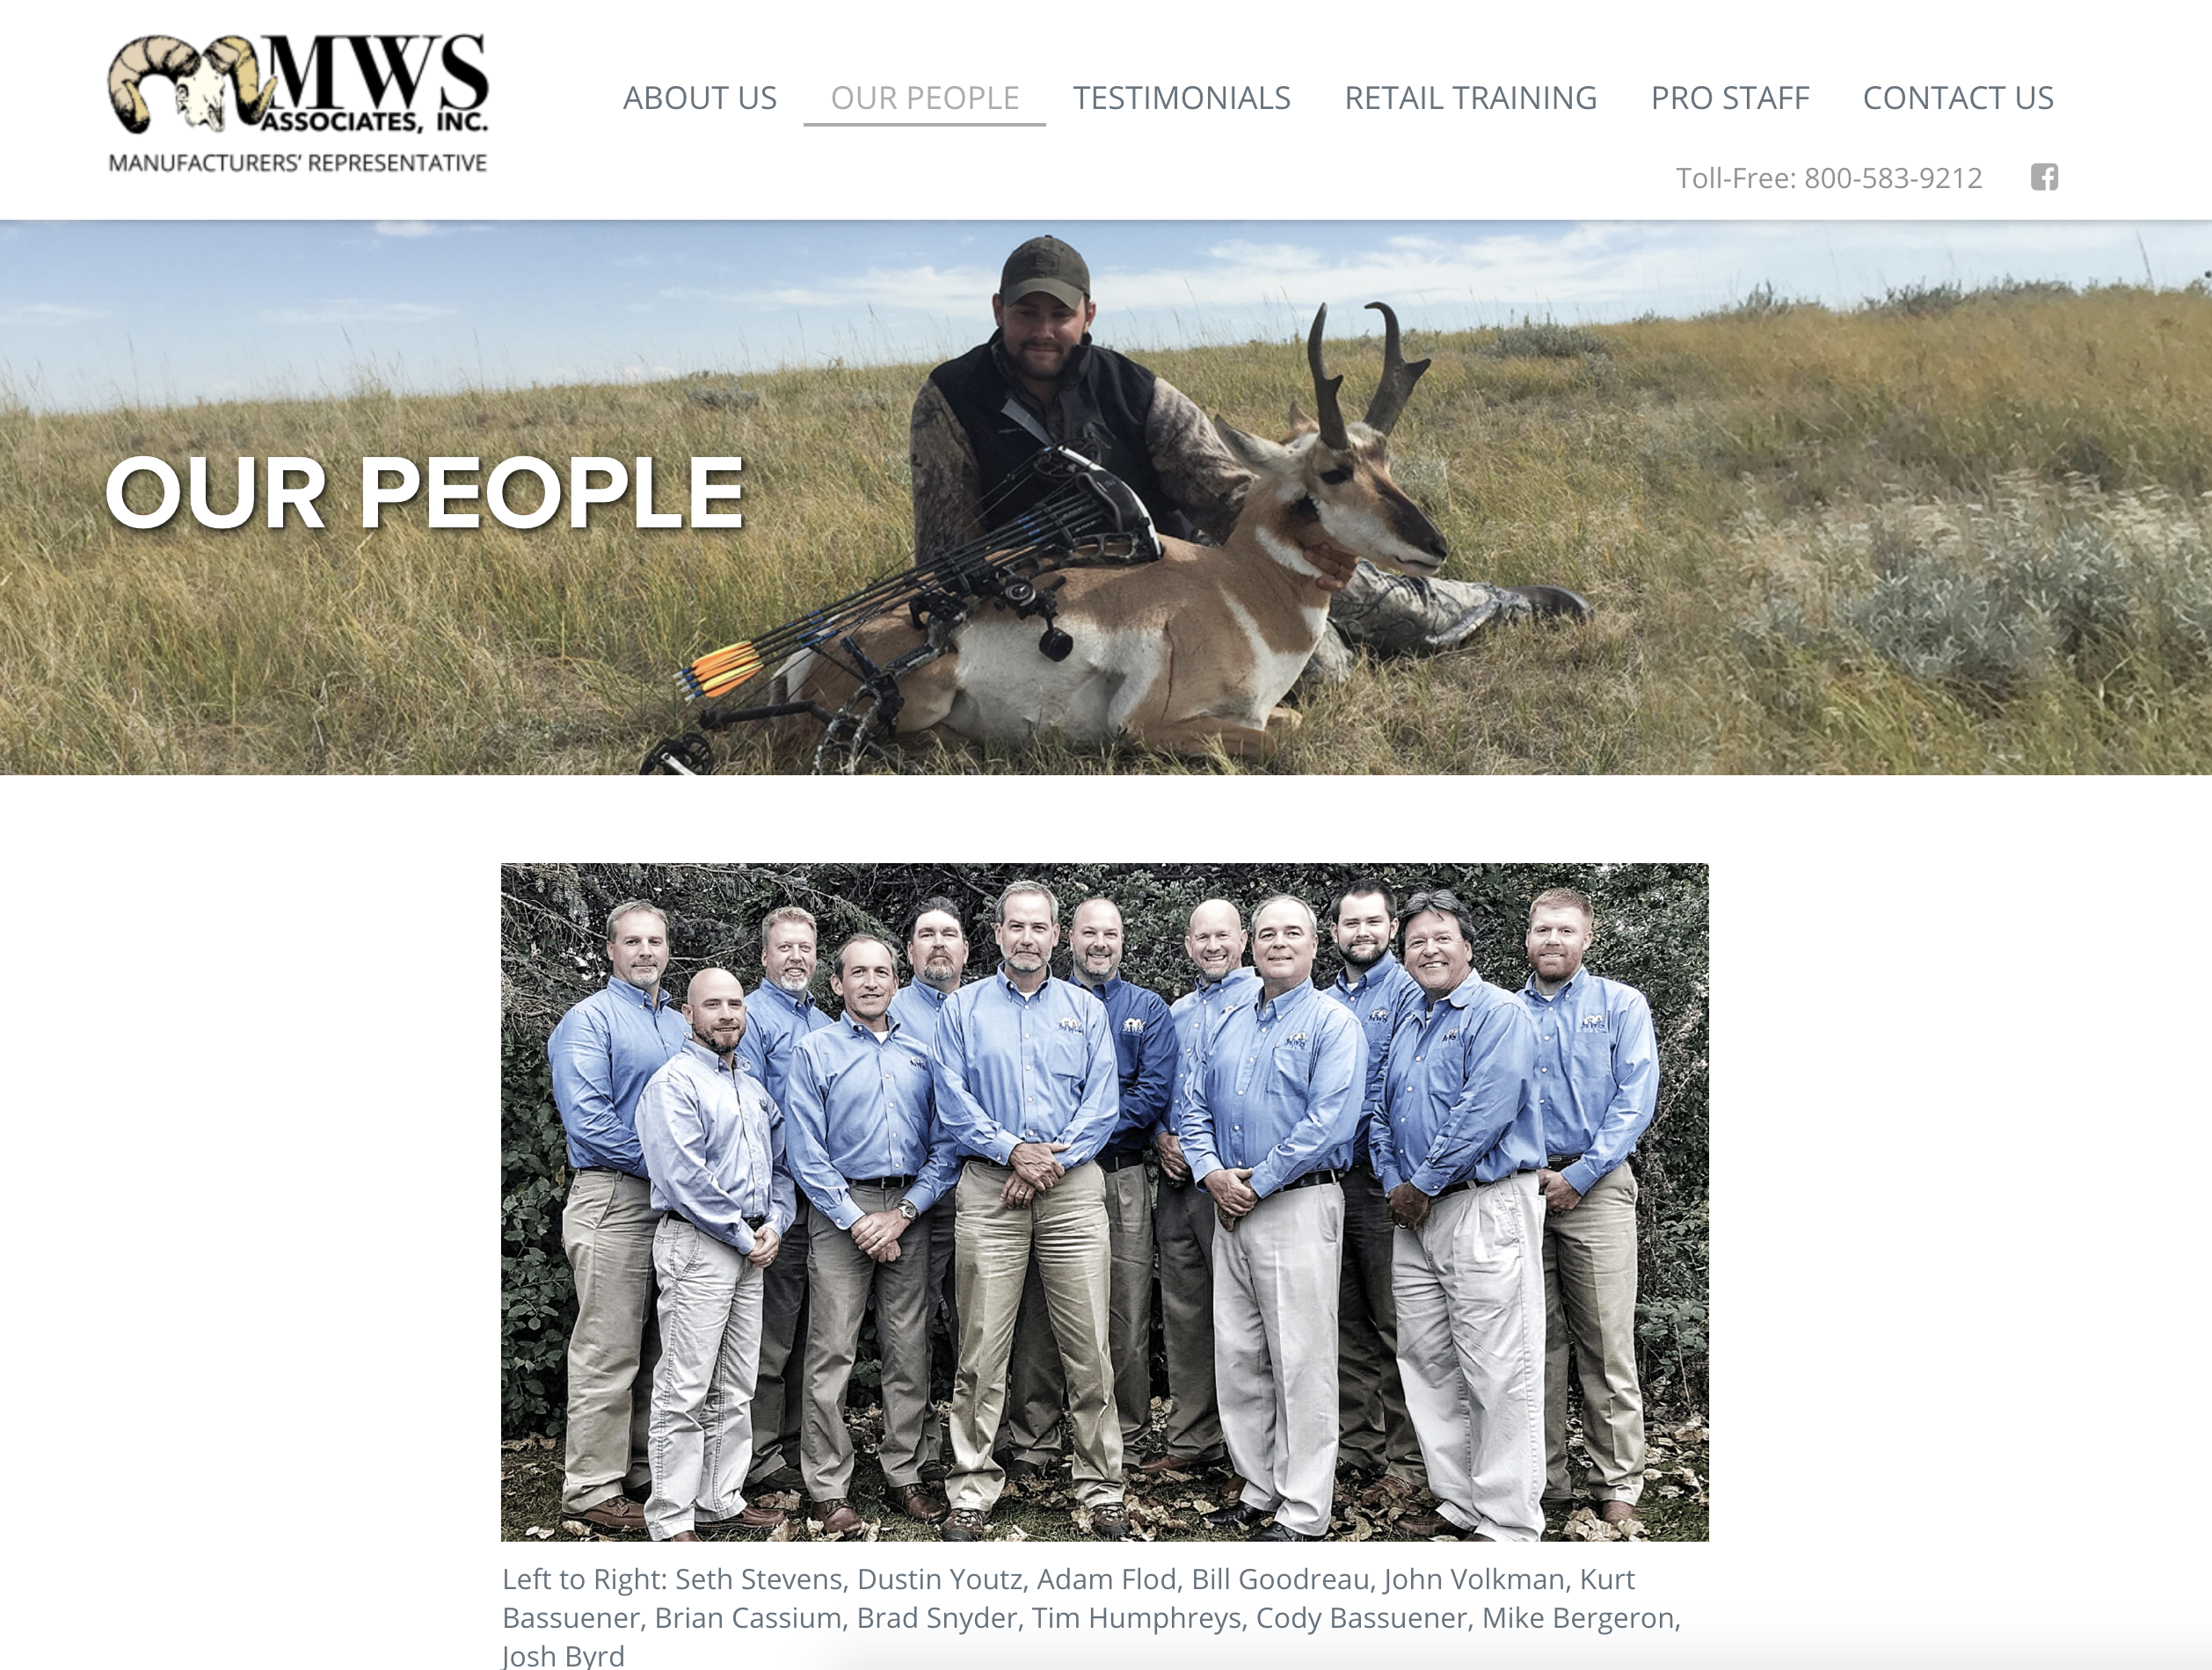 MWS Associates, Inc.